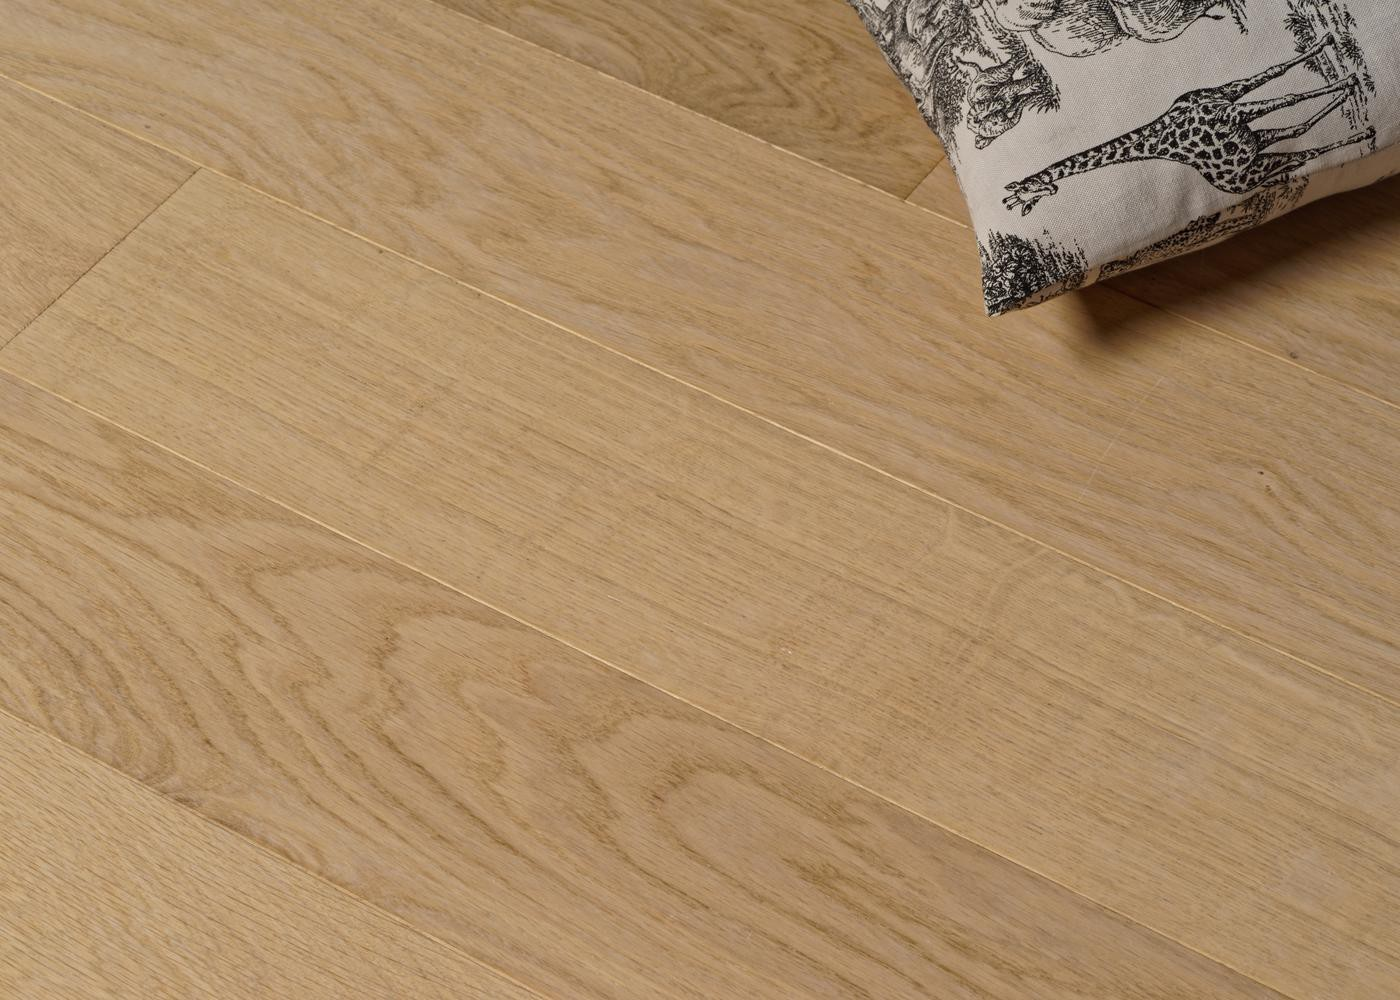 Parquet chêne contrecollé CÔME brossé vernis mat Select support HDF 10x92x1420